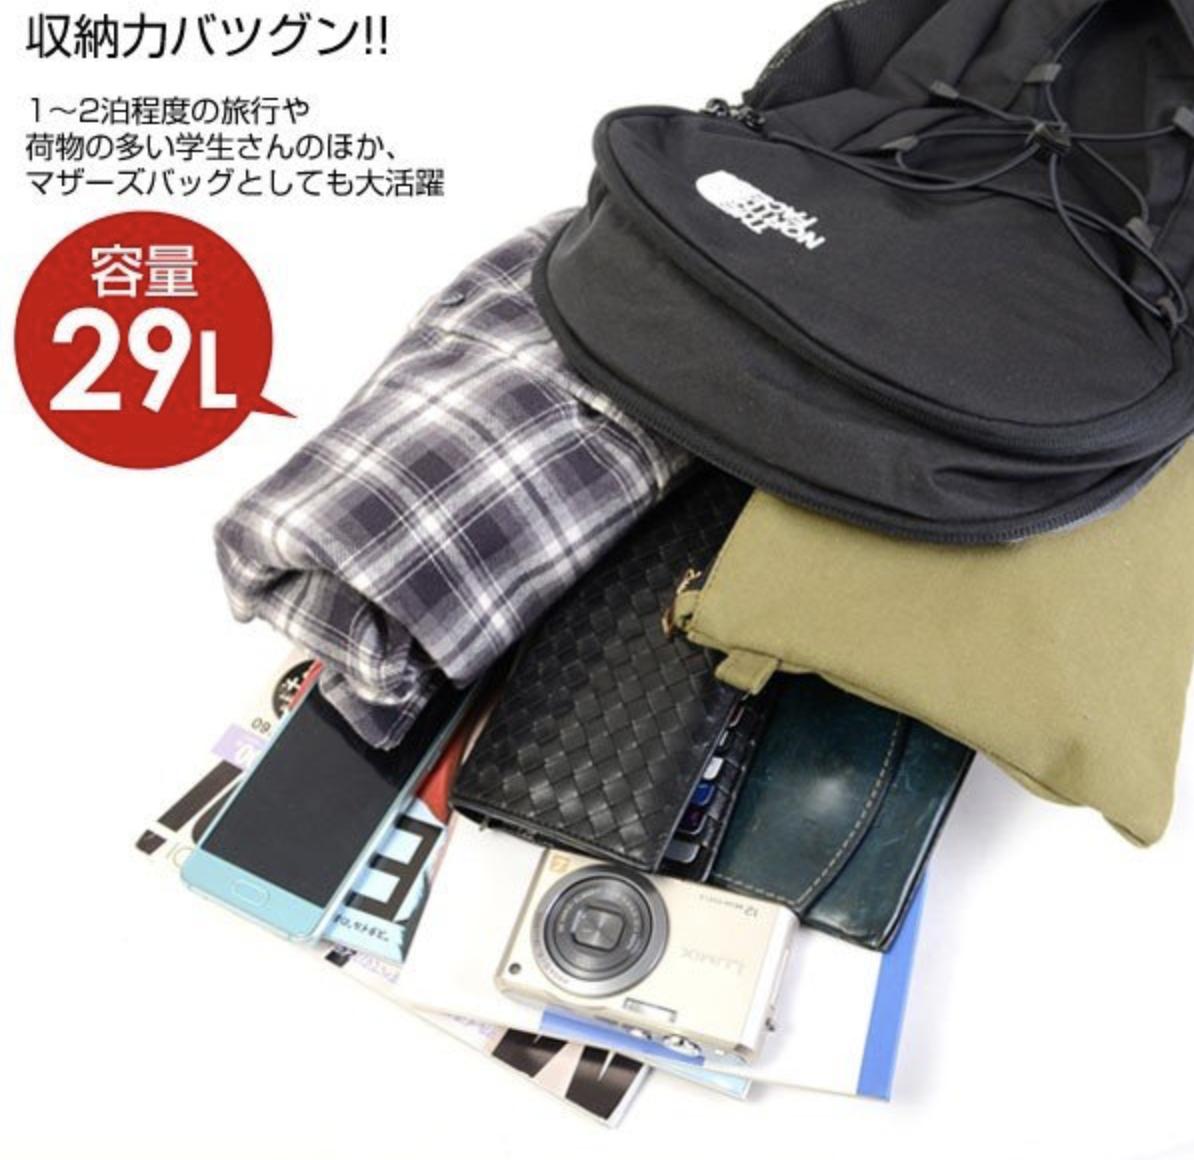 f:id:thebackpack:20191014111921p:plain